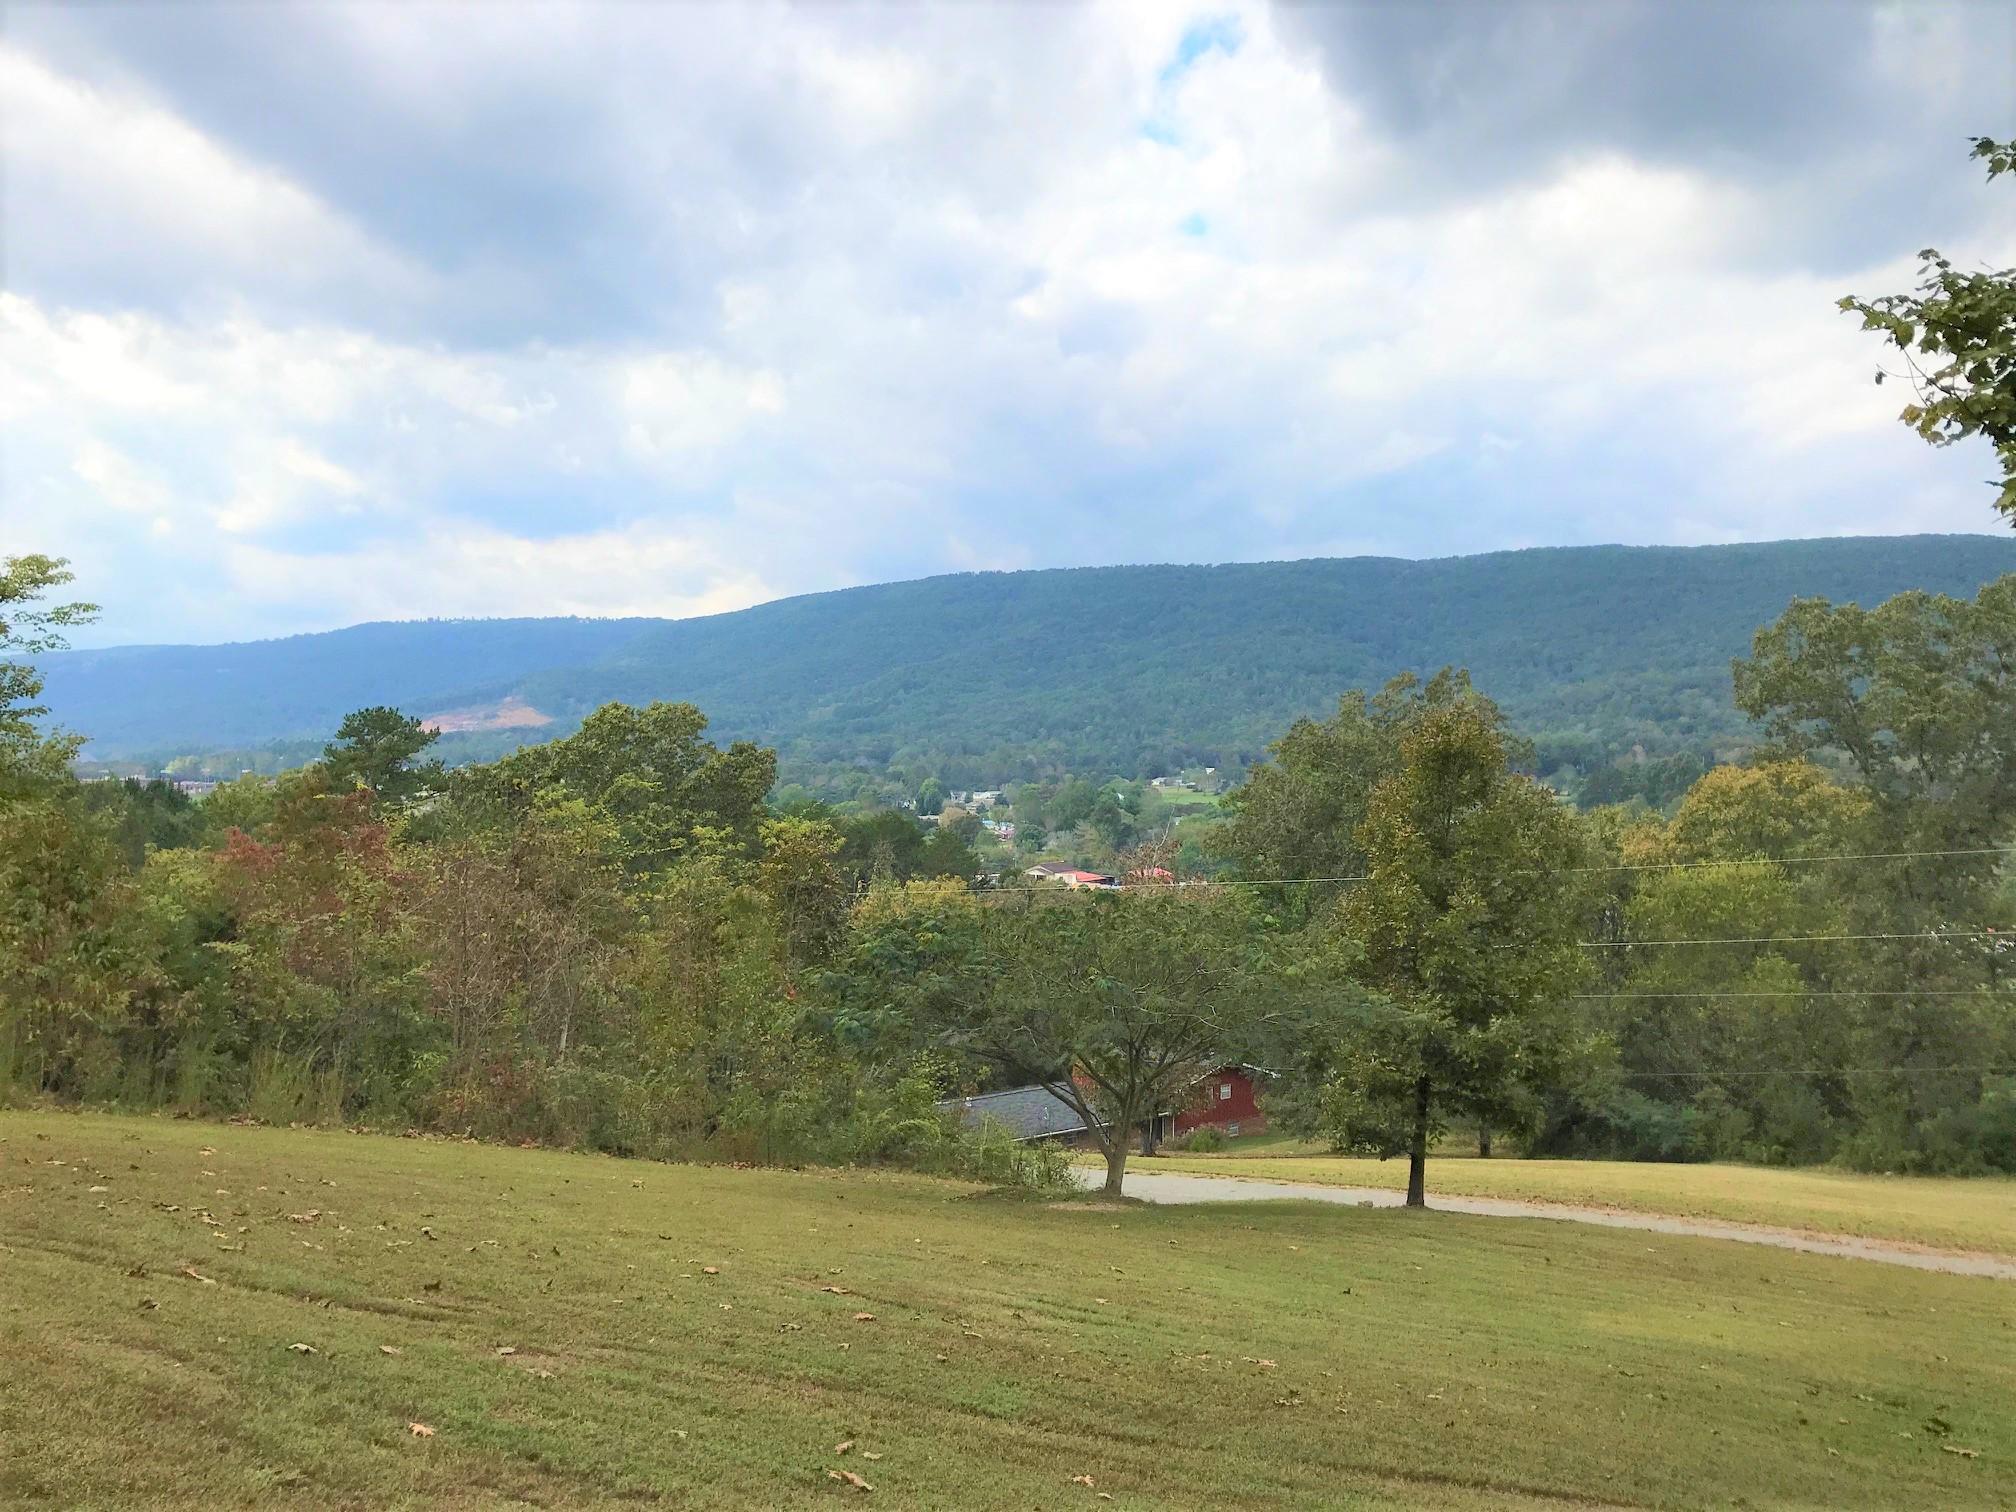 64 Hill Dr, Dunlap, TN 37327